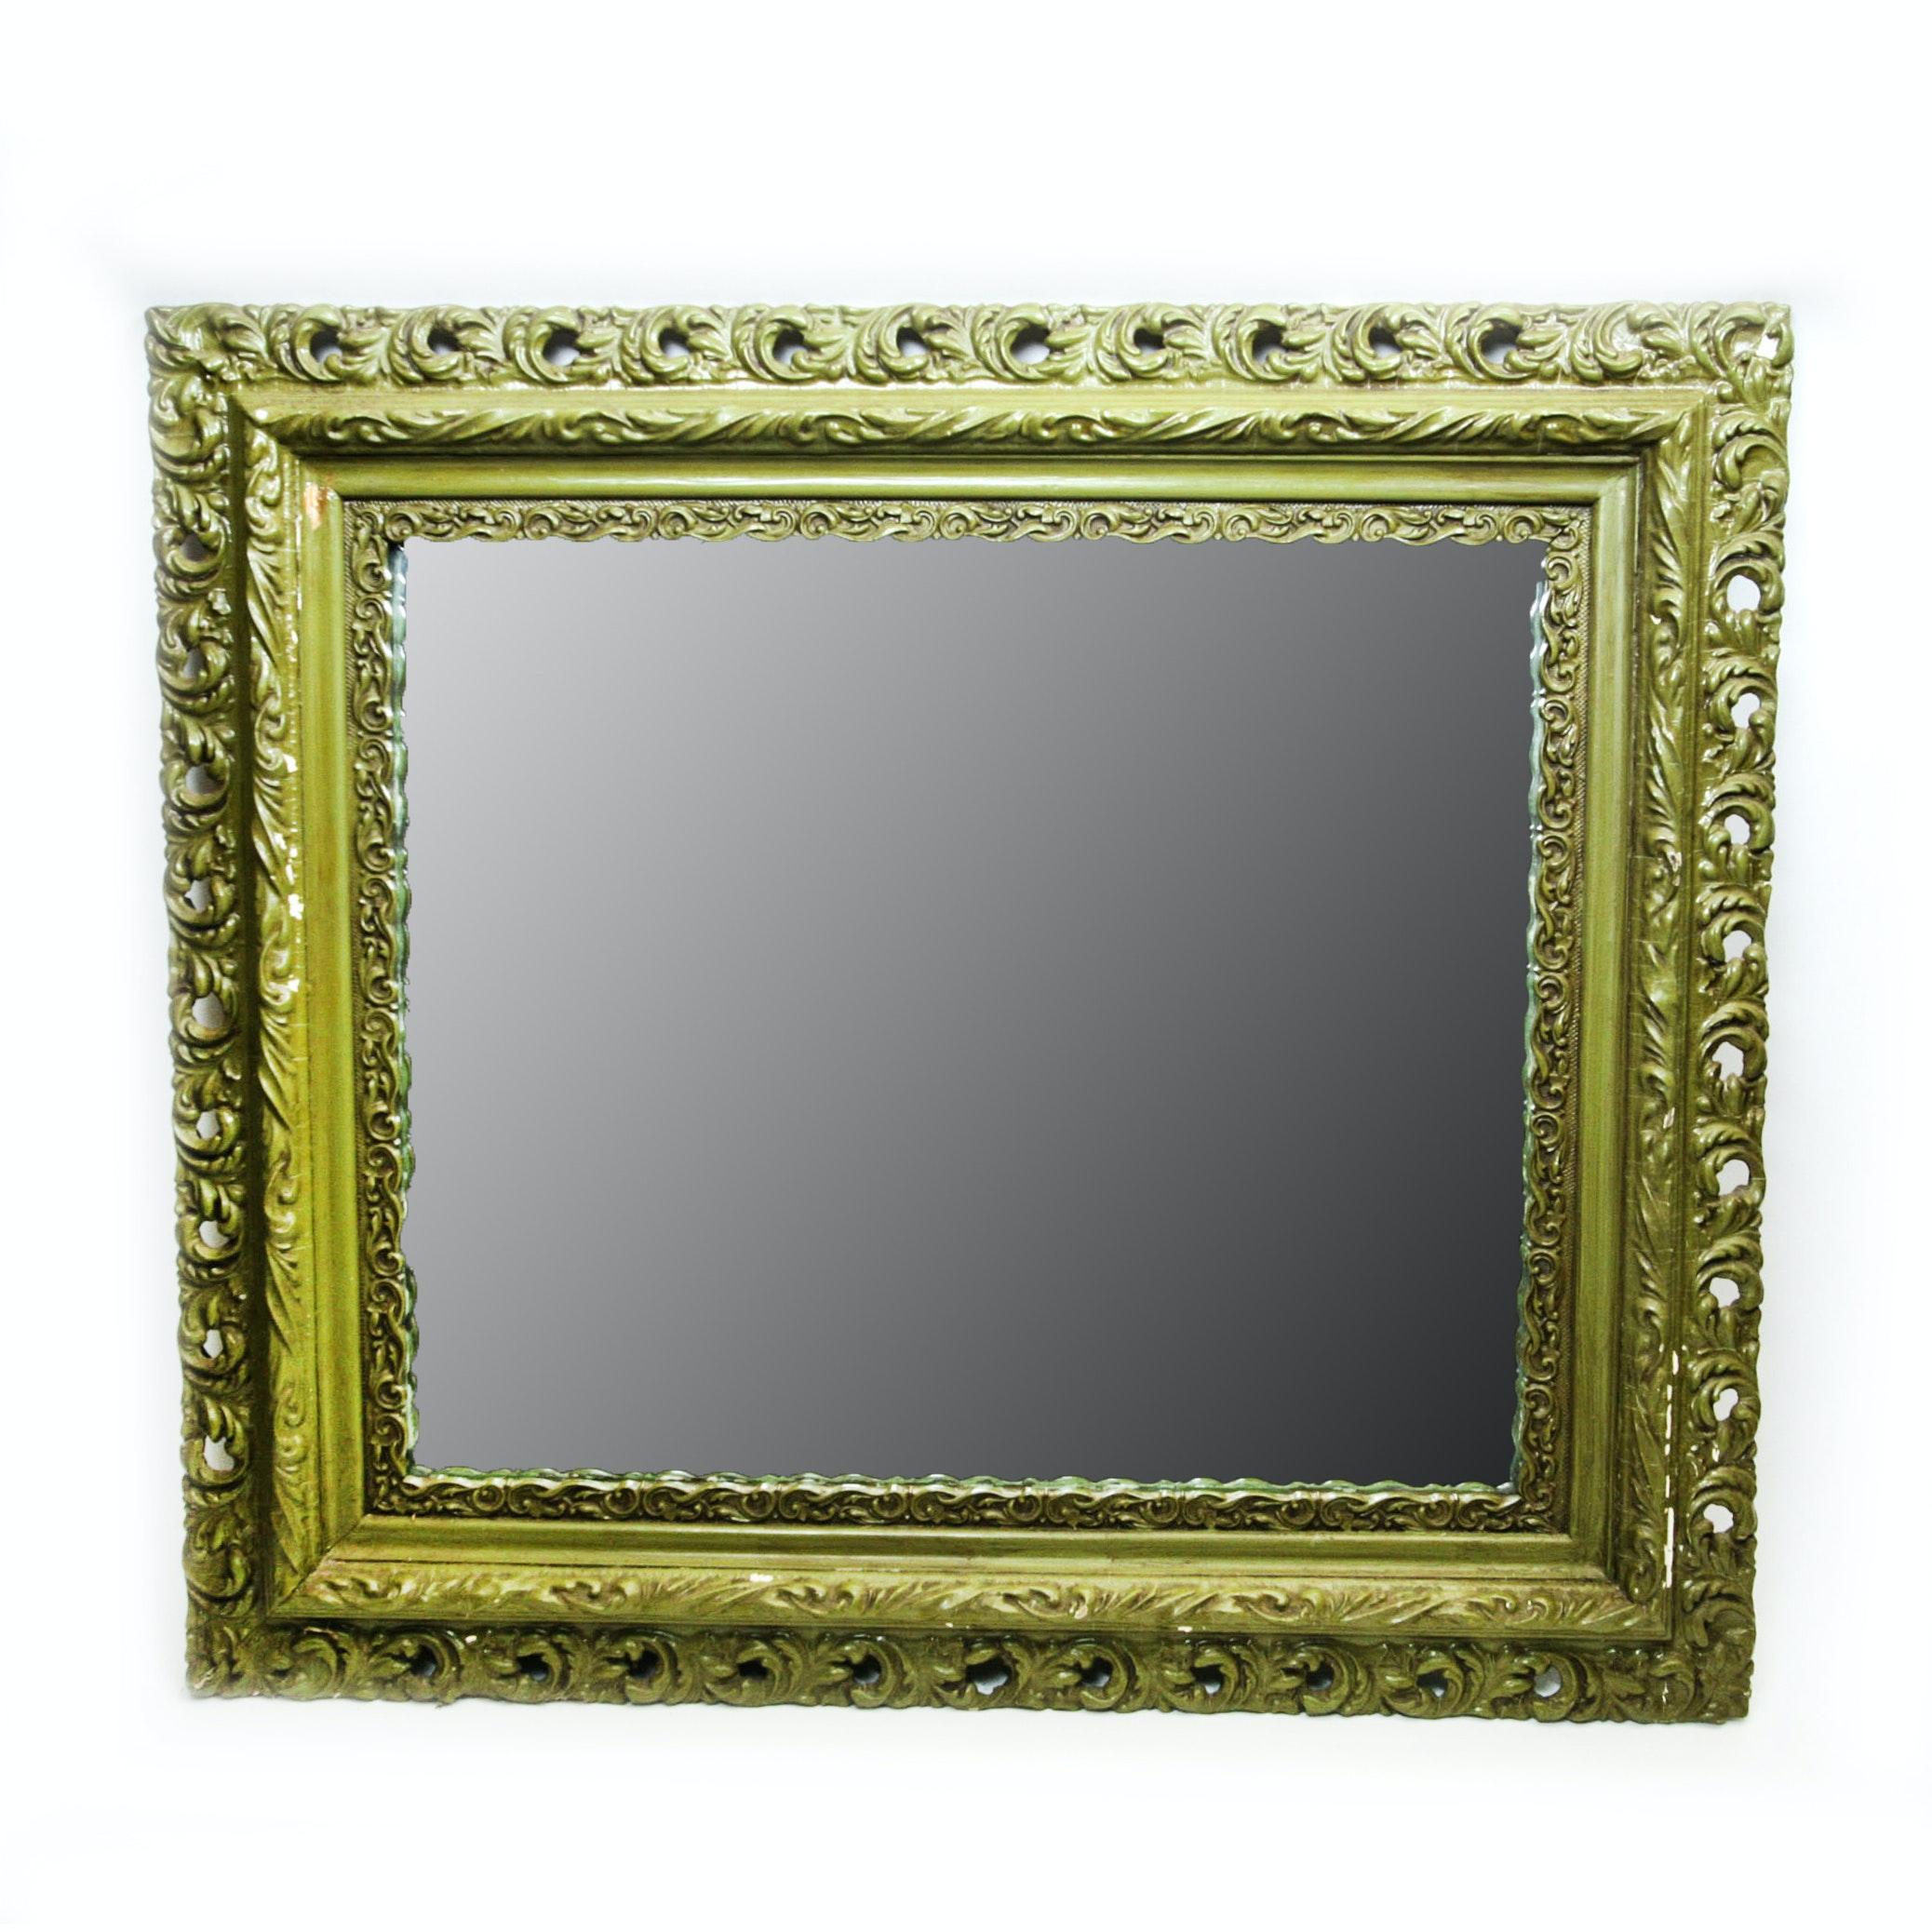 Green Painted Metal Vine Frame Arch Mirror Ebth